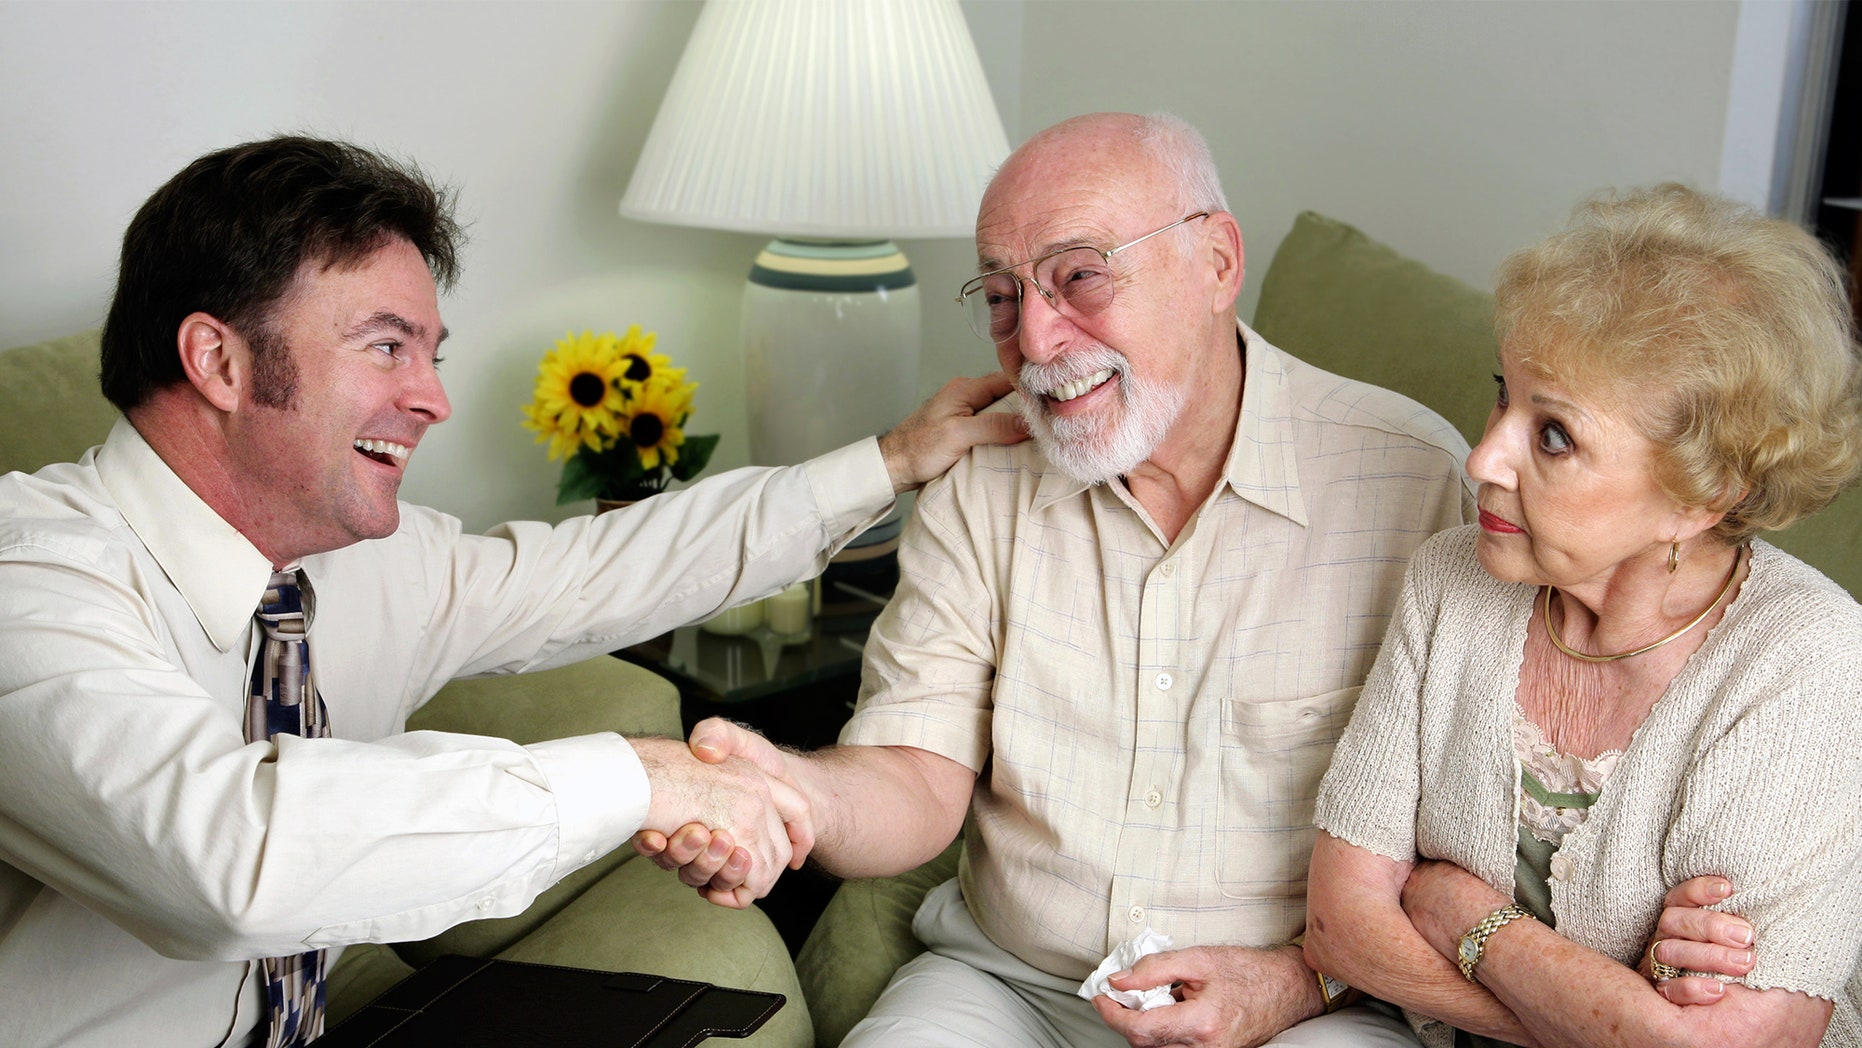 Elderly couple signed agreement